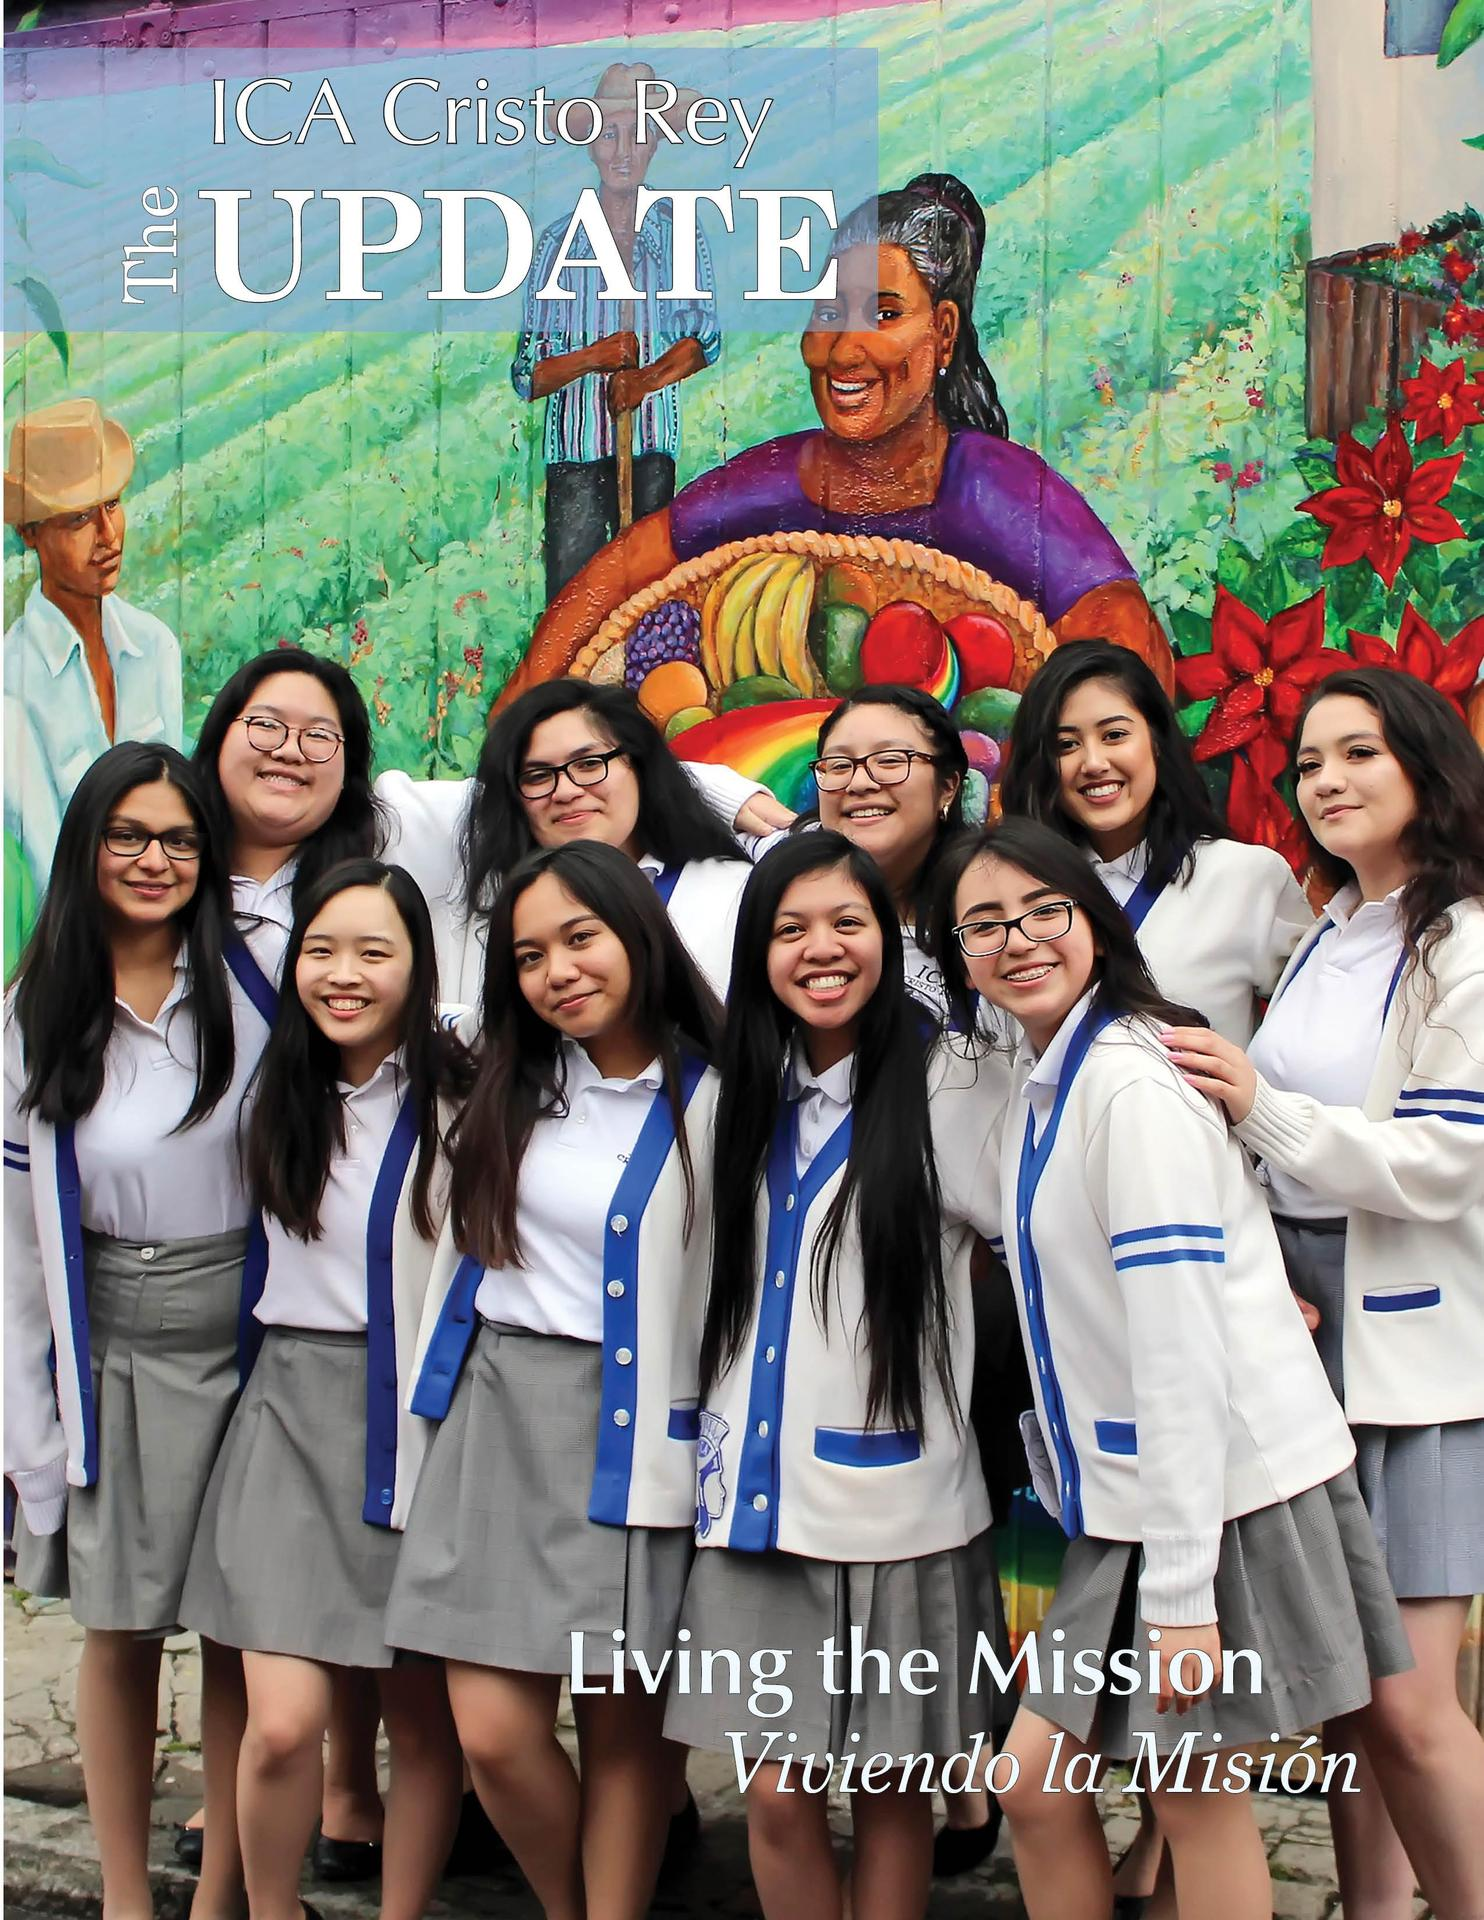 The ICA Cristo Rey Update | Summer 2018 | No 112